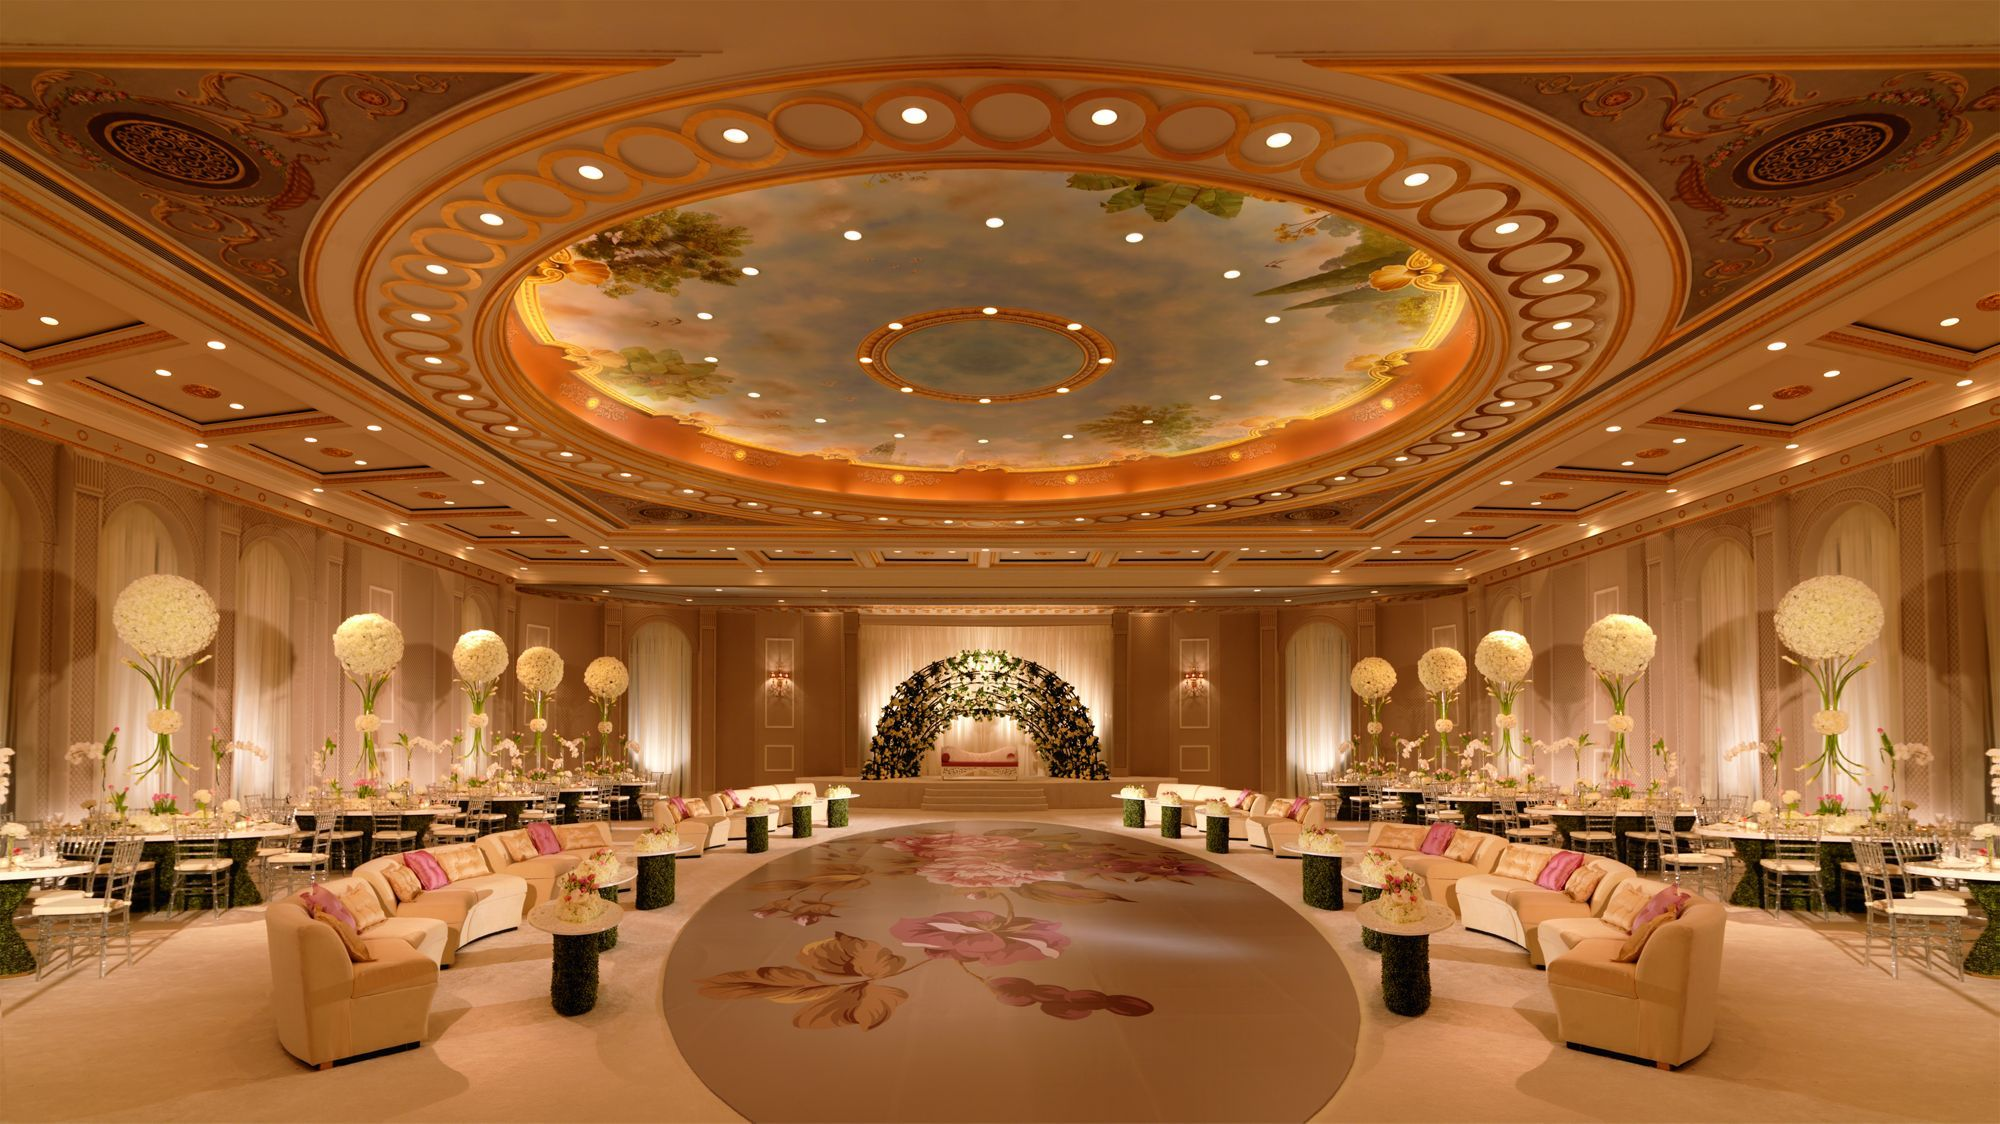 Stretch Ceiling Lighting | Banquet hall, Ritz carlton ...